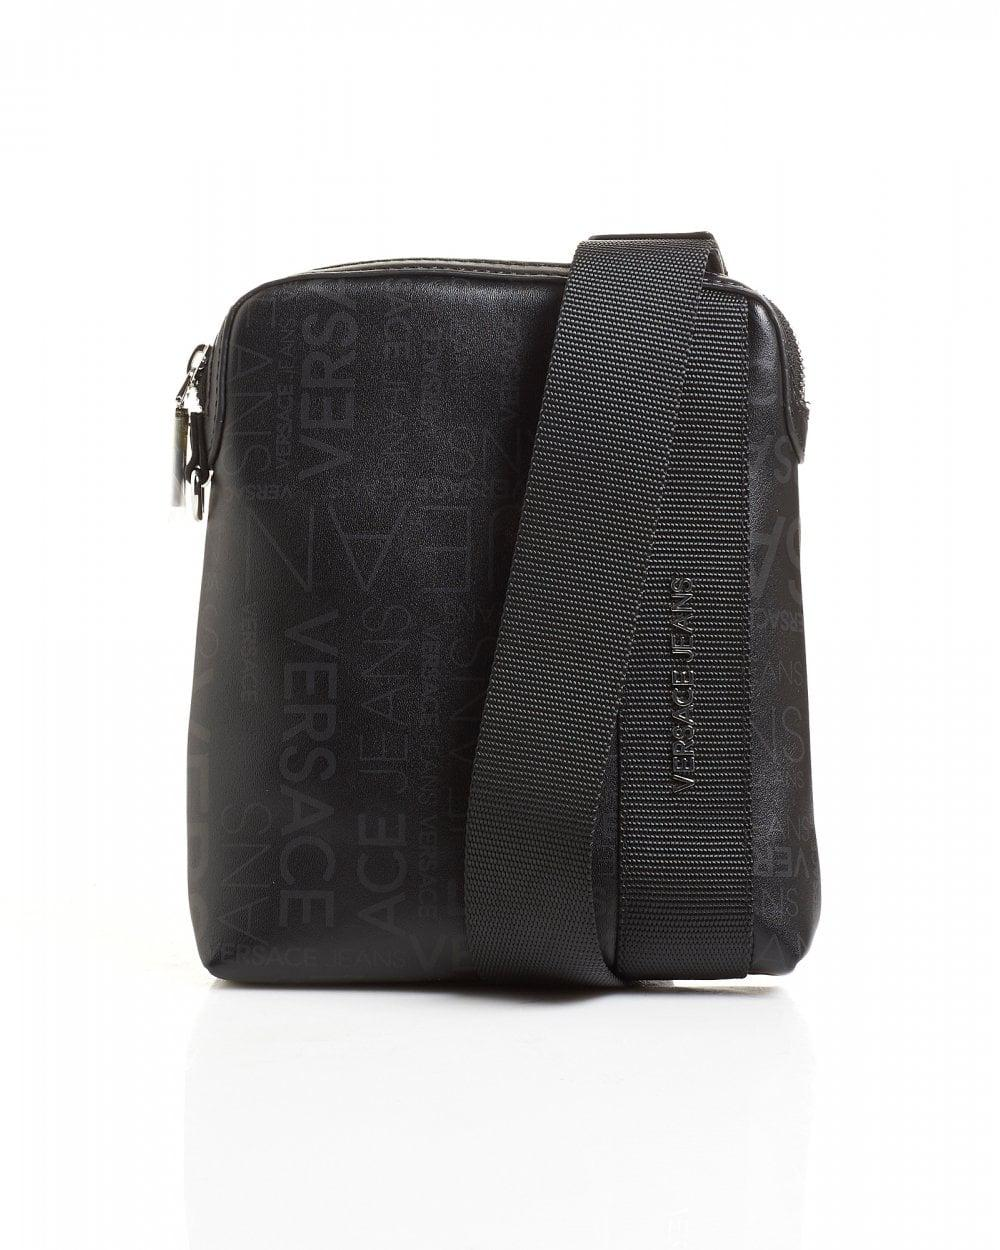 22506bab6e2 Versace Jeans All Over Logo Printed Black Stash Bag in Black for Men ...